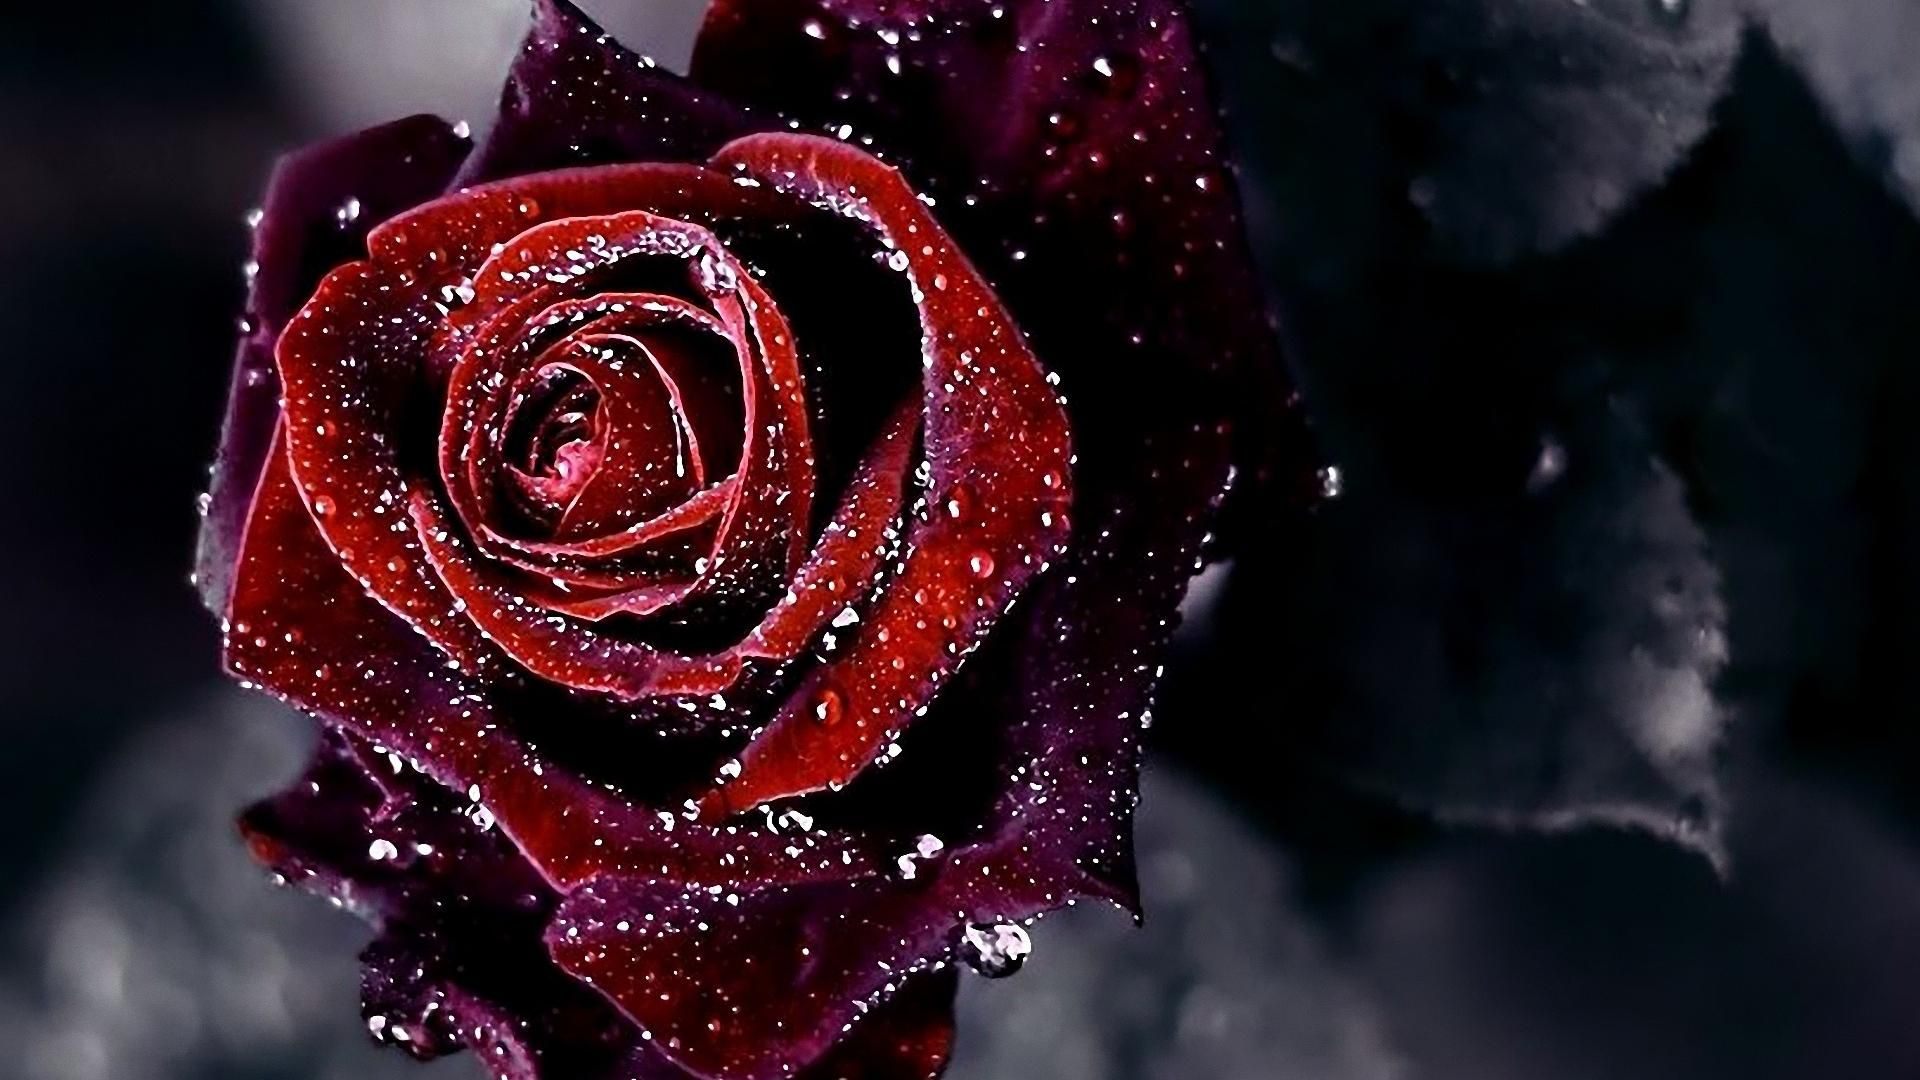 Red Rose Wallpaper Hd Full Sdownload